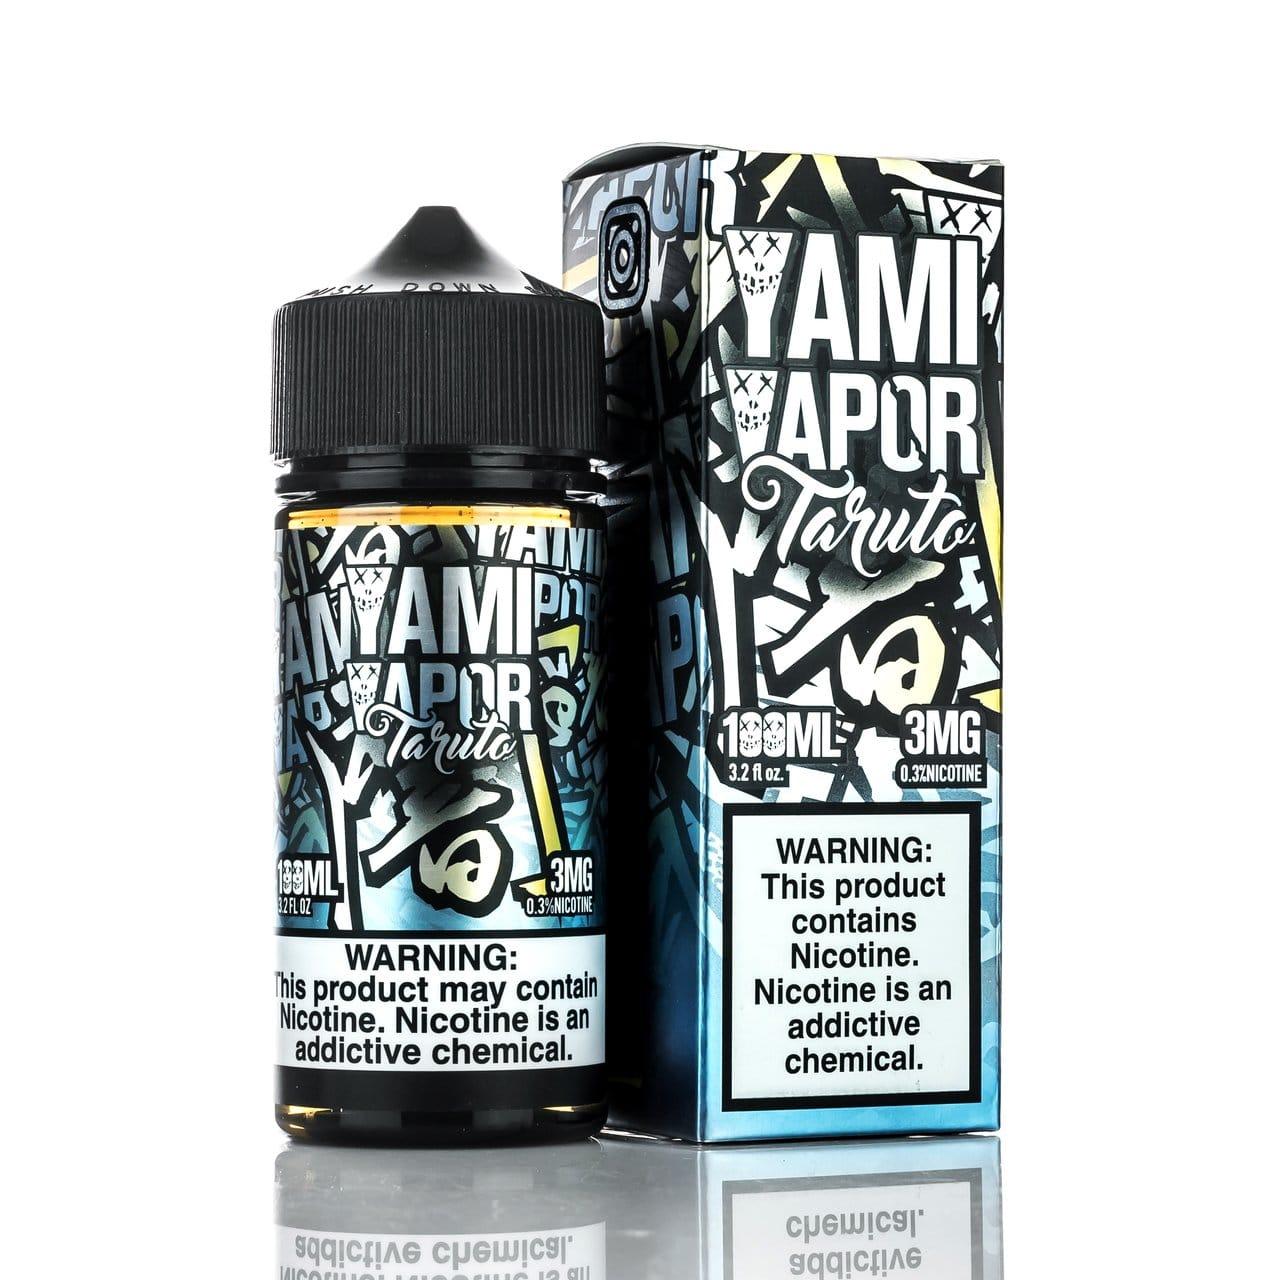 Yami Vapor Taruto 100ml & 30ml Vape Juice